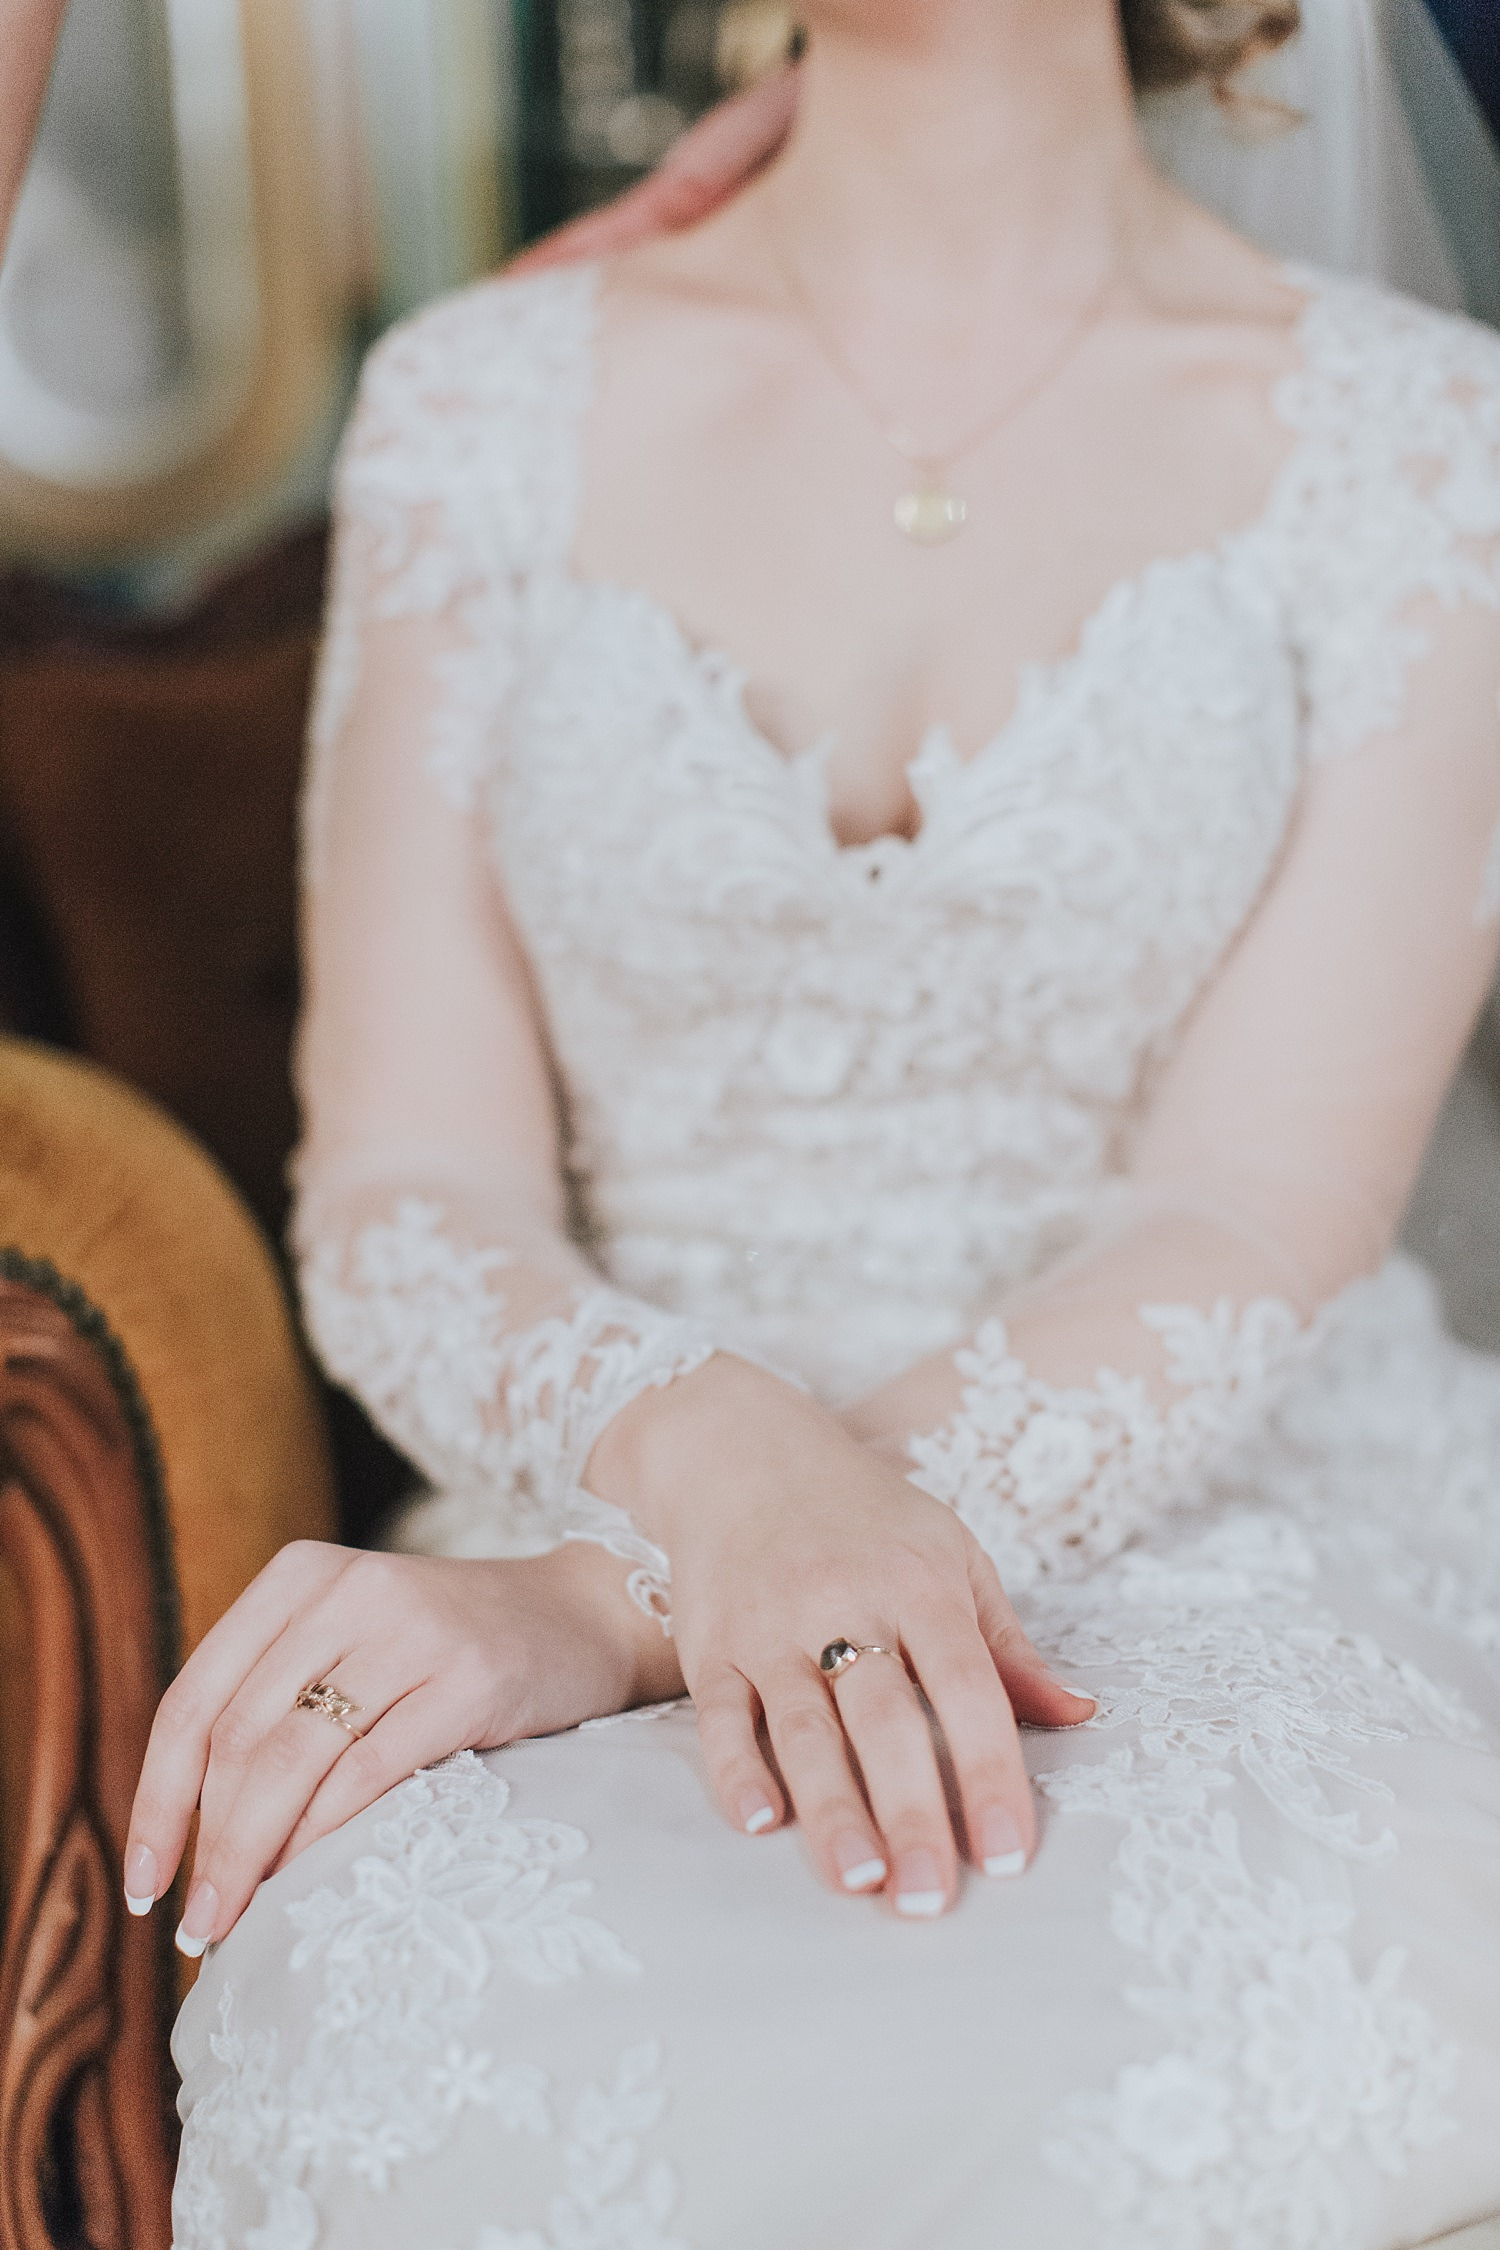 beautiful bride enjoying her wedding day